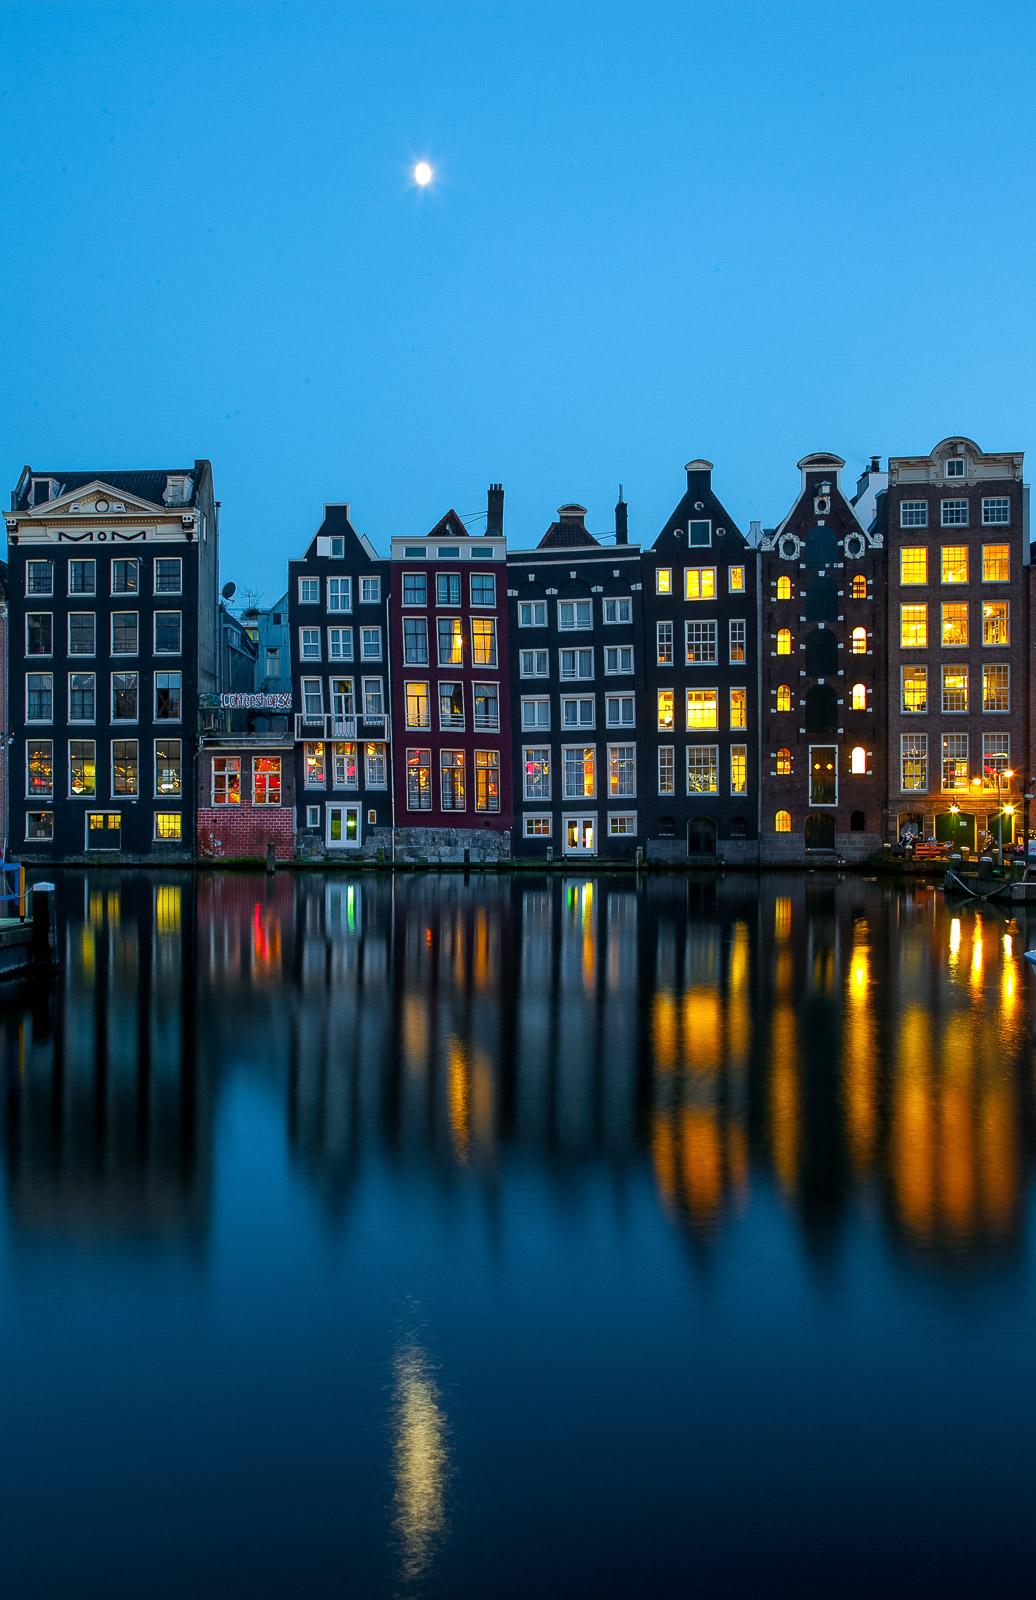 Amsterdam windows reflecting in water. Artem Savateev